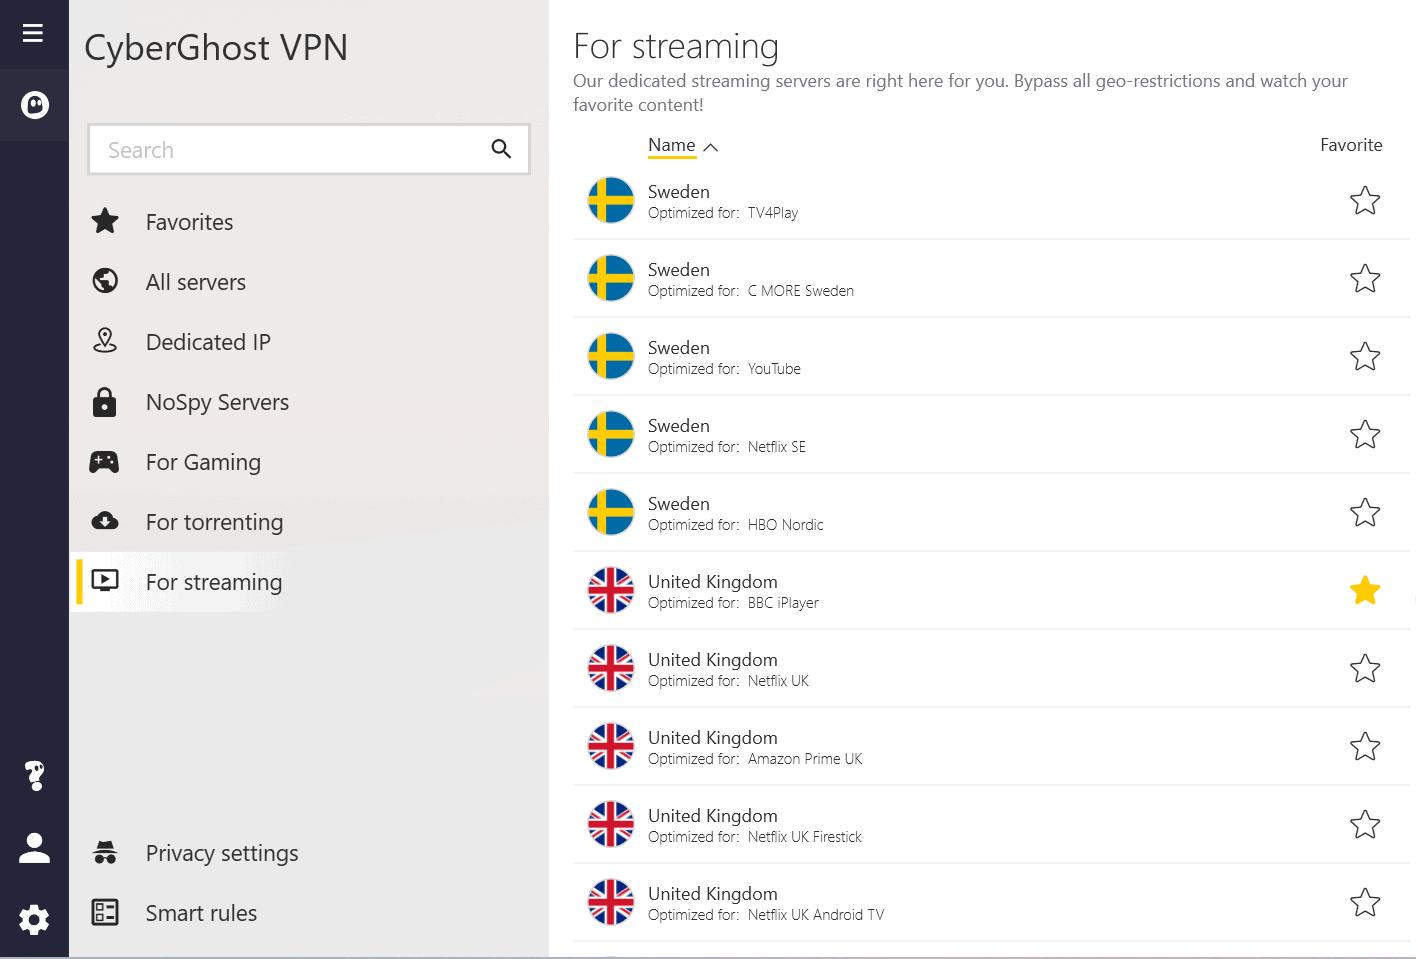 cyberghost streaming servers